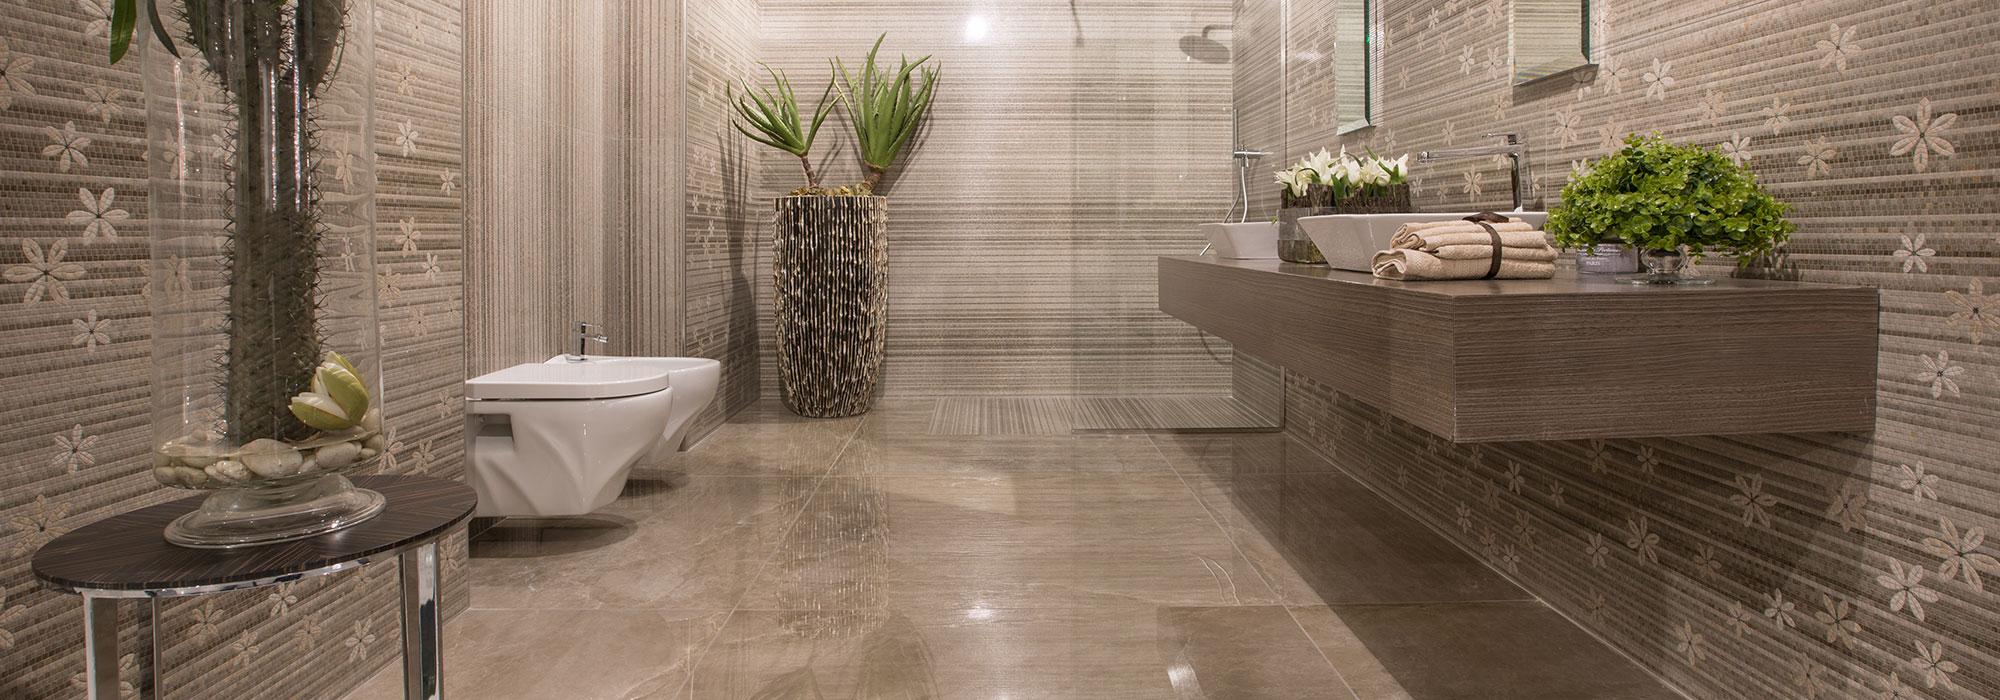 بالصور سيراميكا كليوباترا حمامات , جدد حمامك بسيراميكا كليوباتر 5304 13